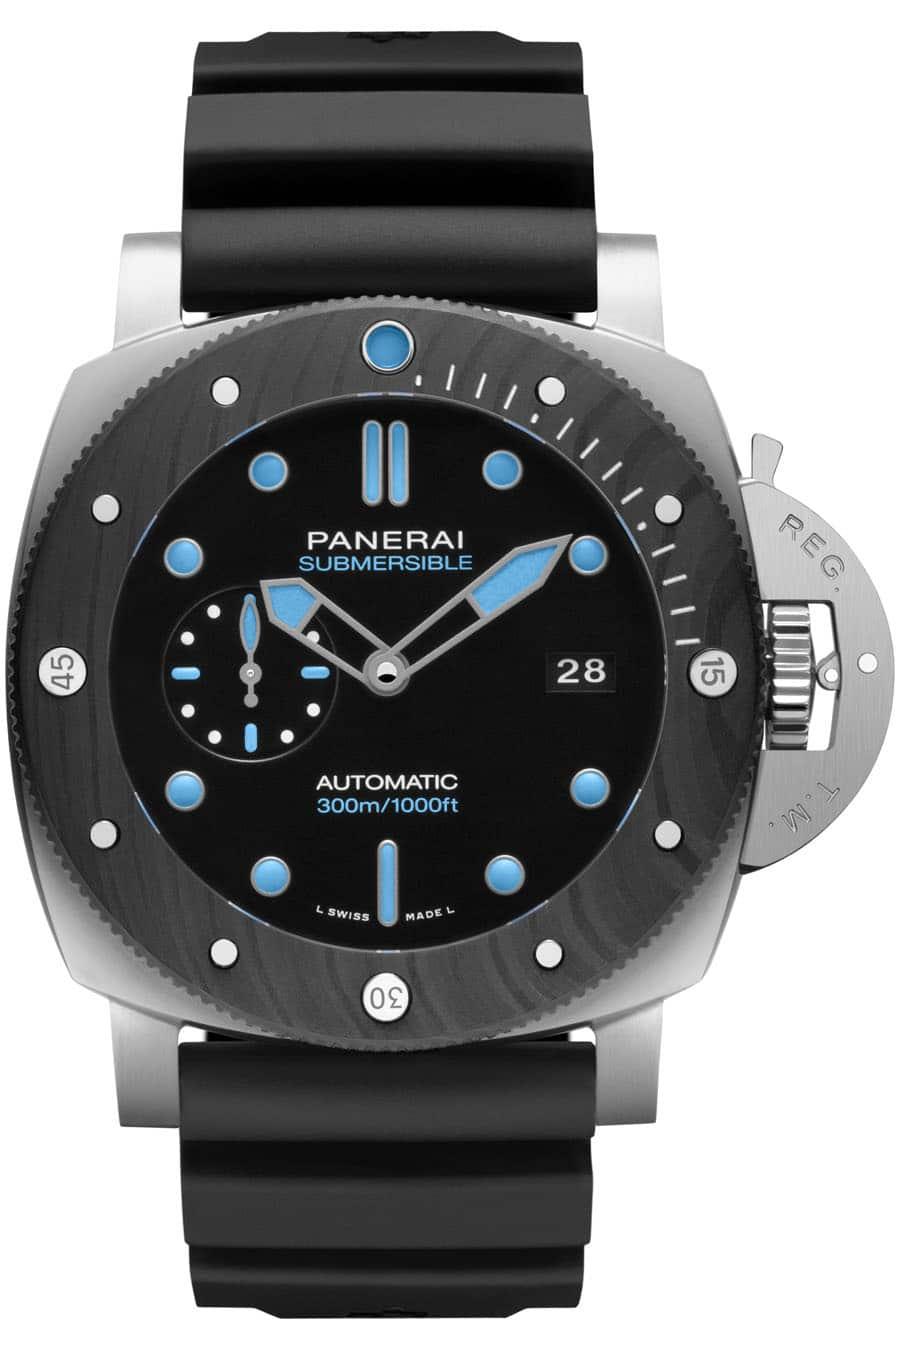 Panerai: Submersible BMG-Tech (PAM00799)